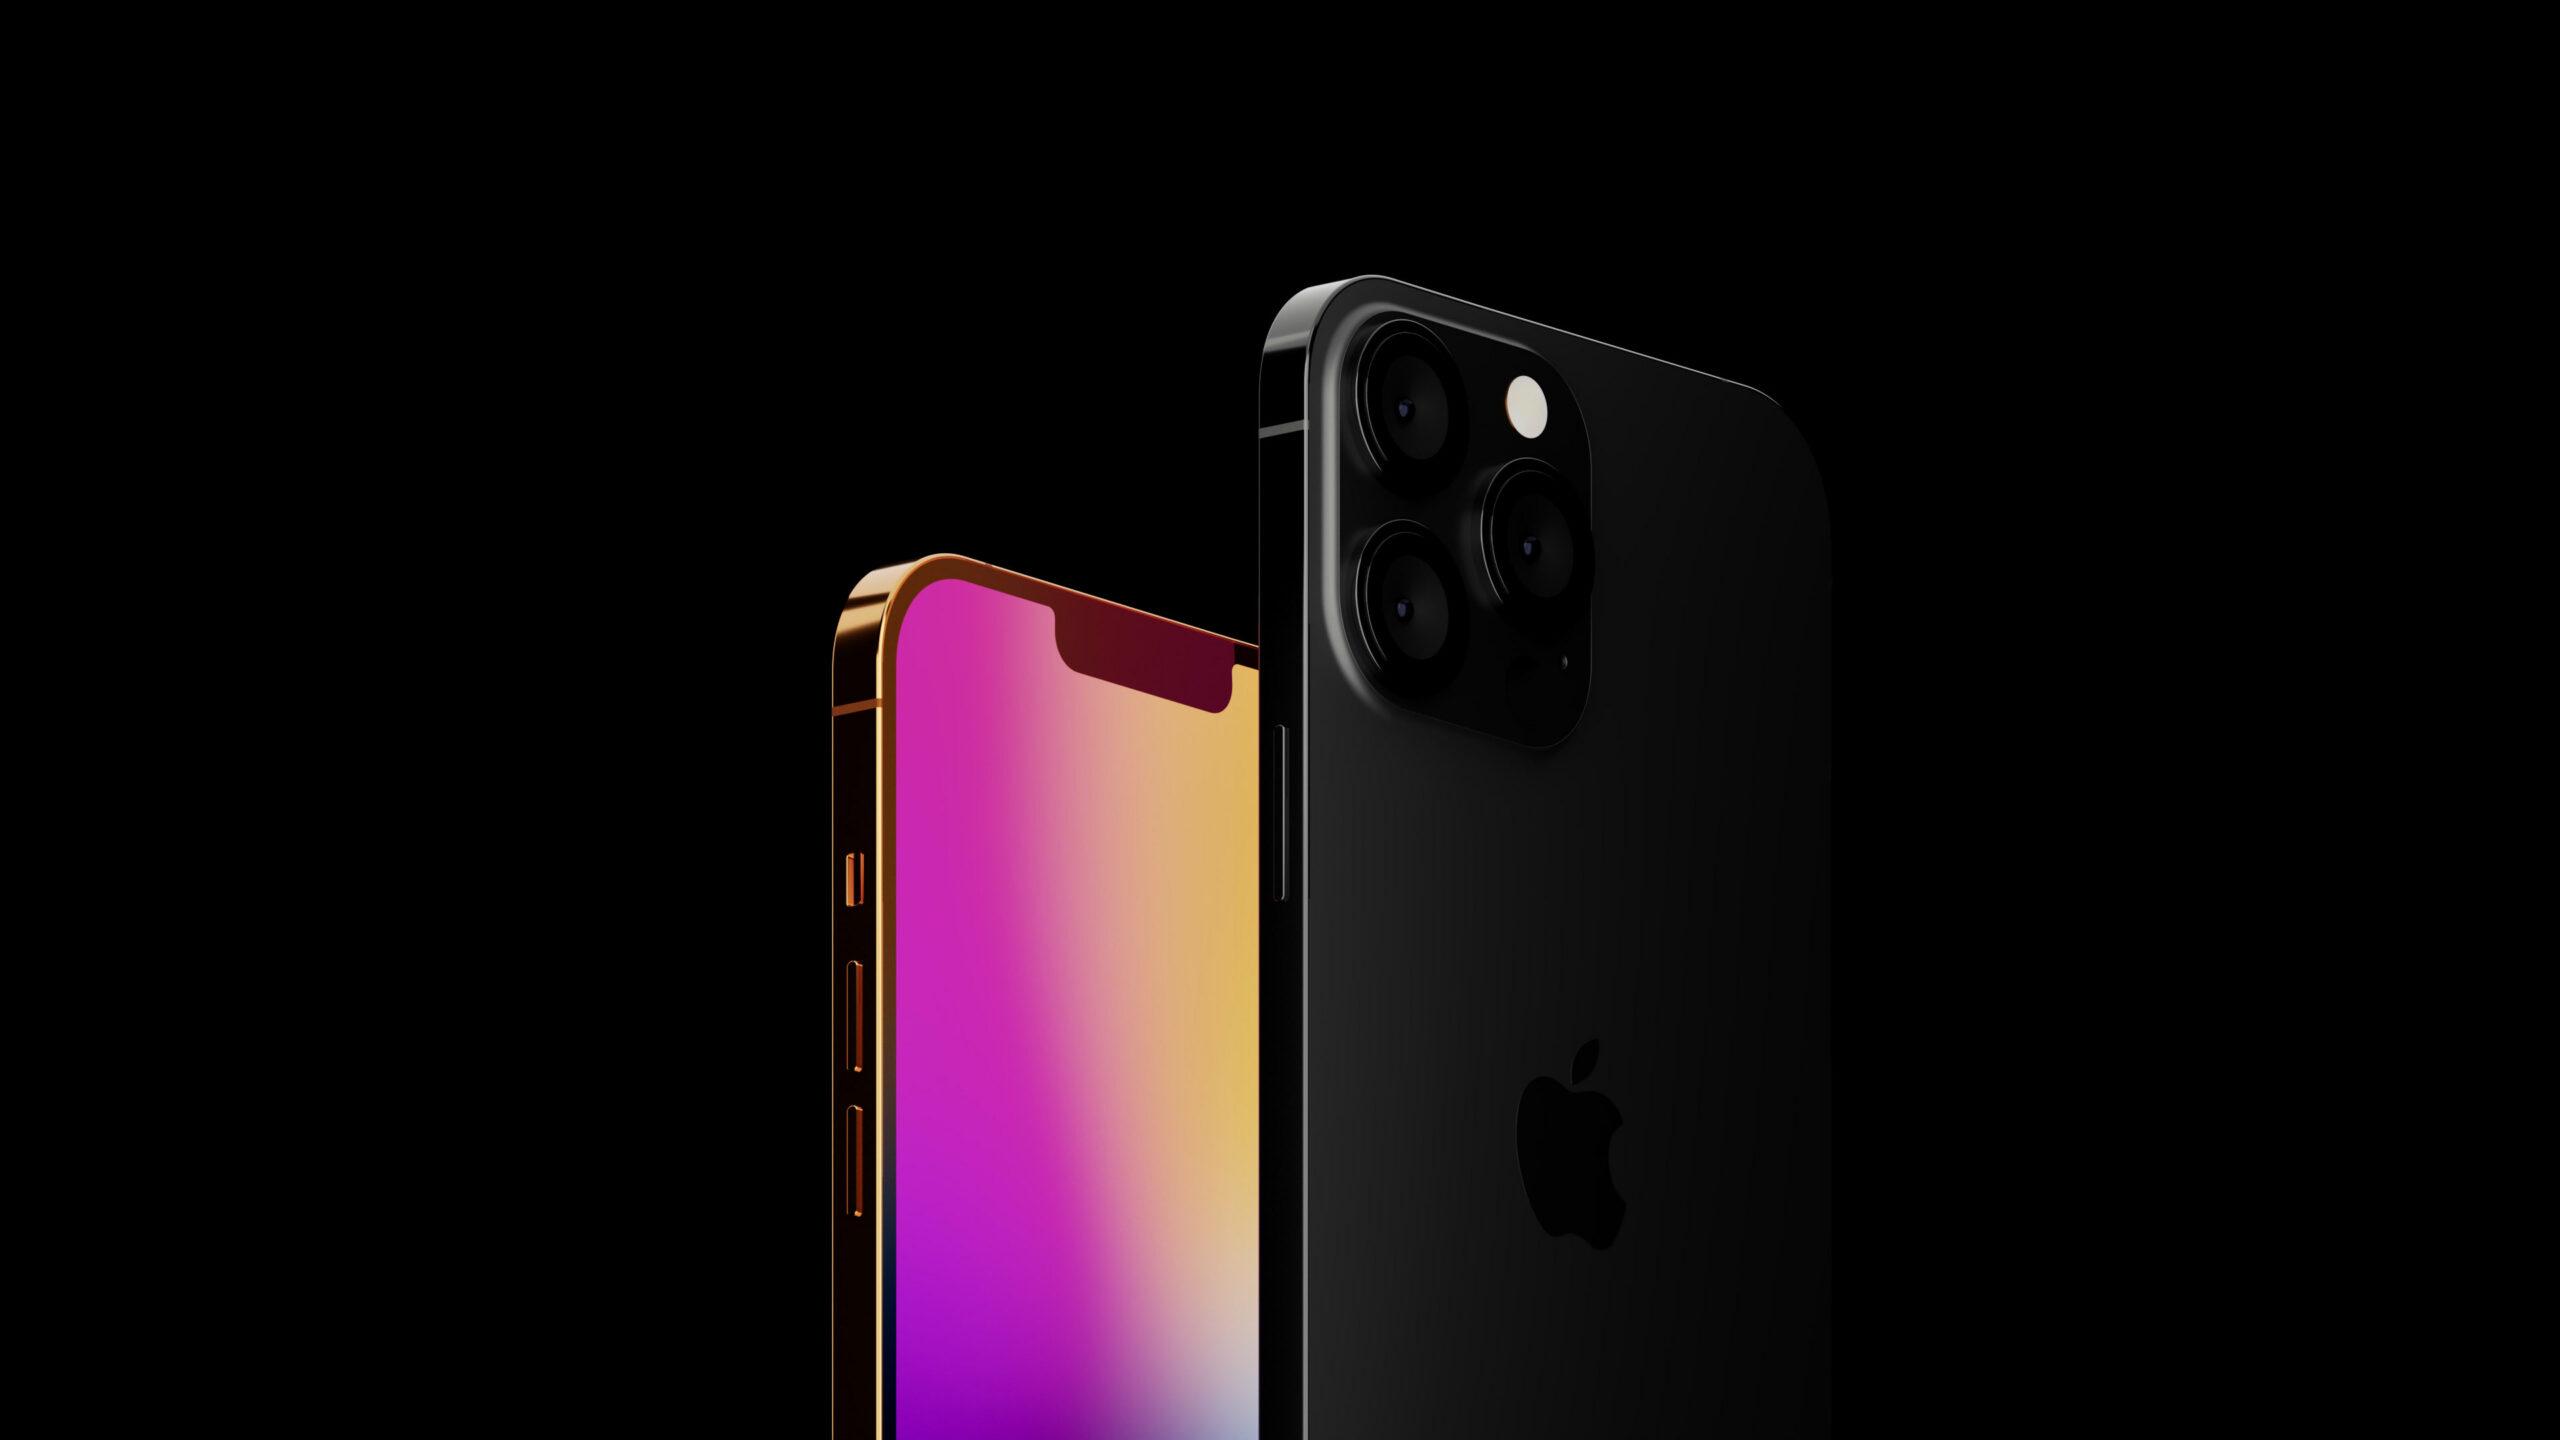 iPhone 13 VS iPhone 11 – Display Changes